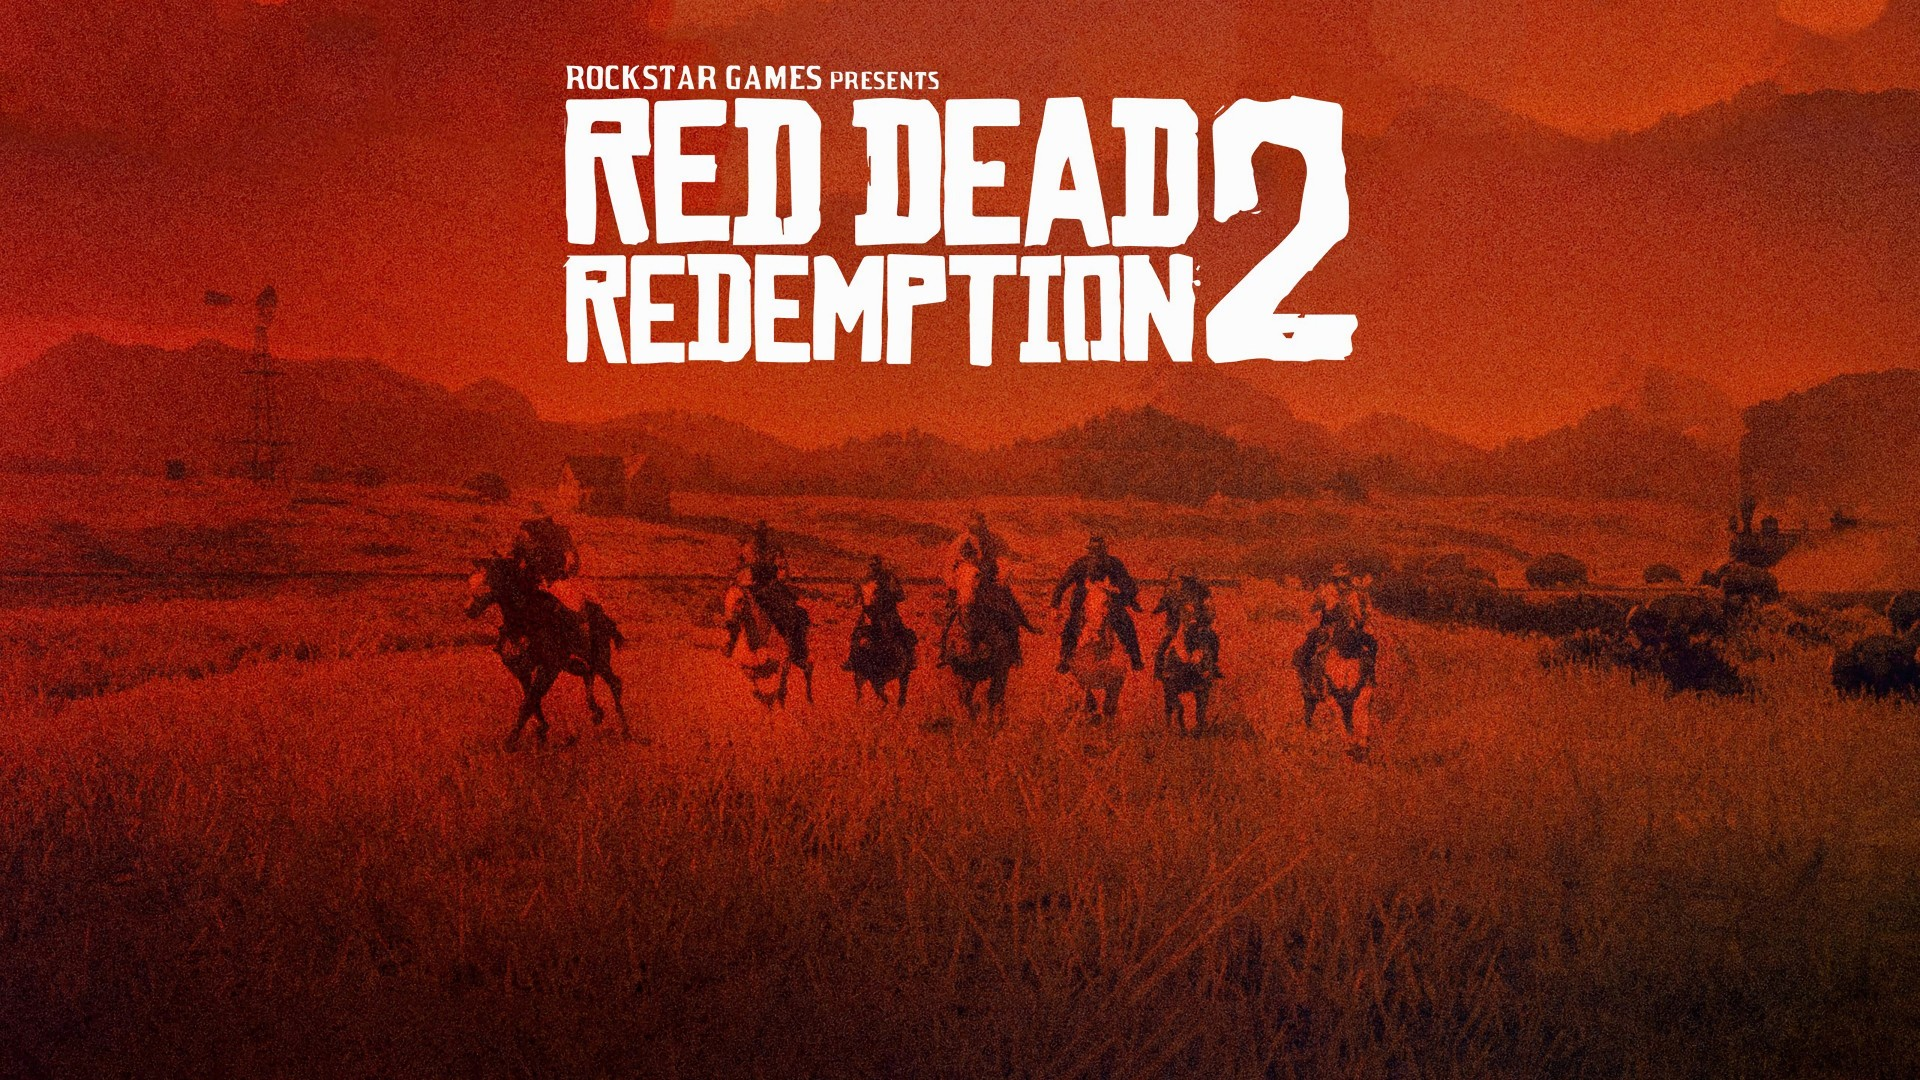 Wallpaper Red Dead Redemption 2, poster, 4K, Games #18211